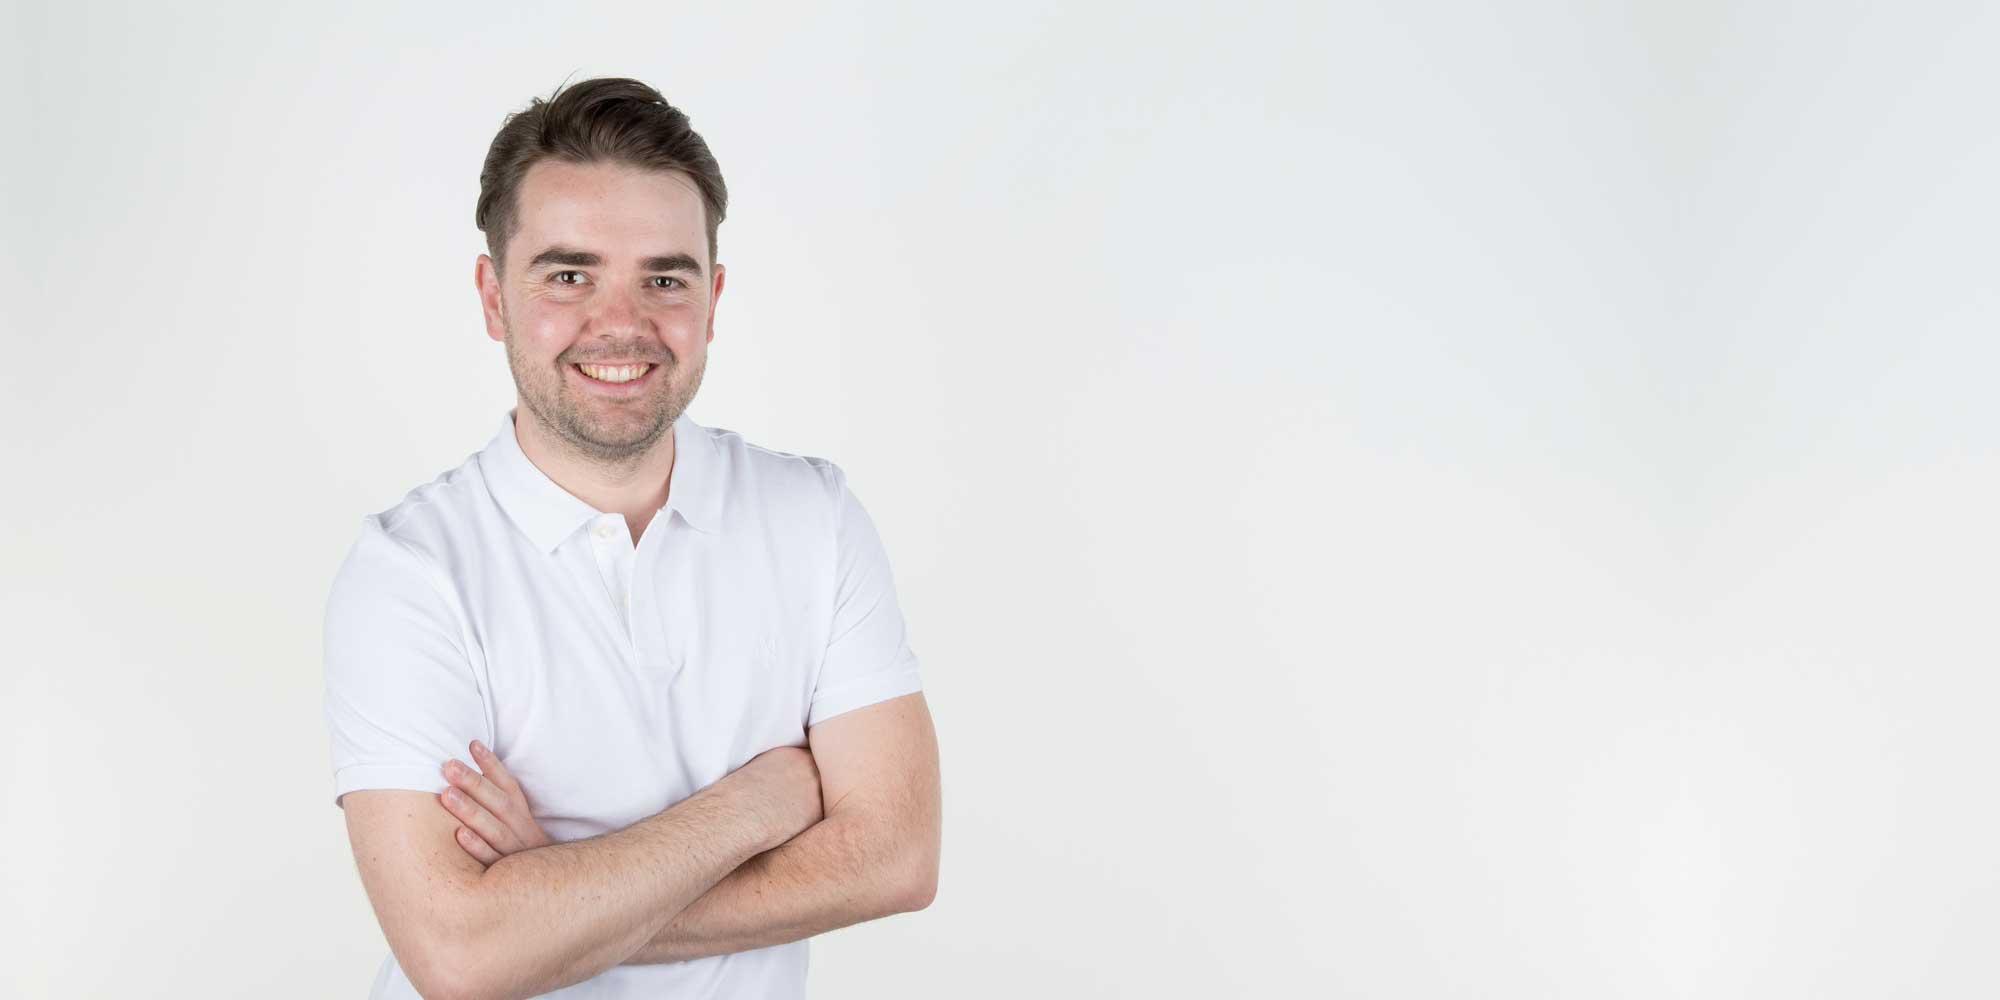 HNO Zentrum Hennef | Dr. med. Tobias van Bremen